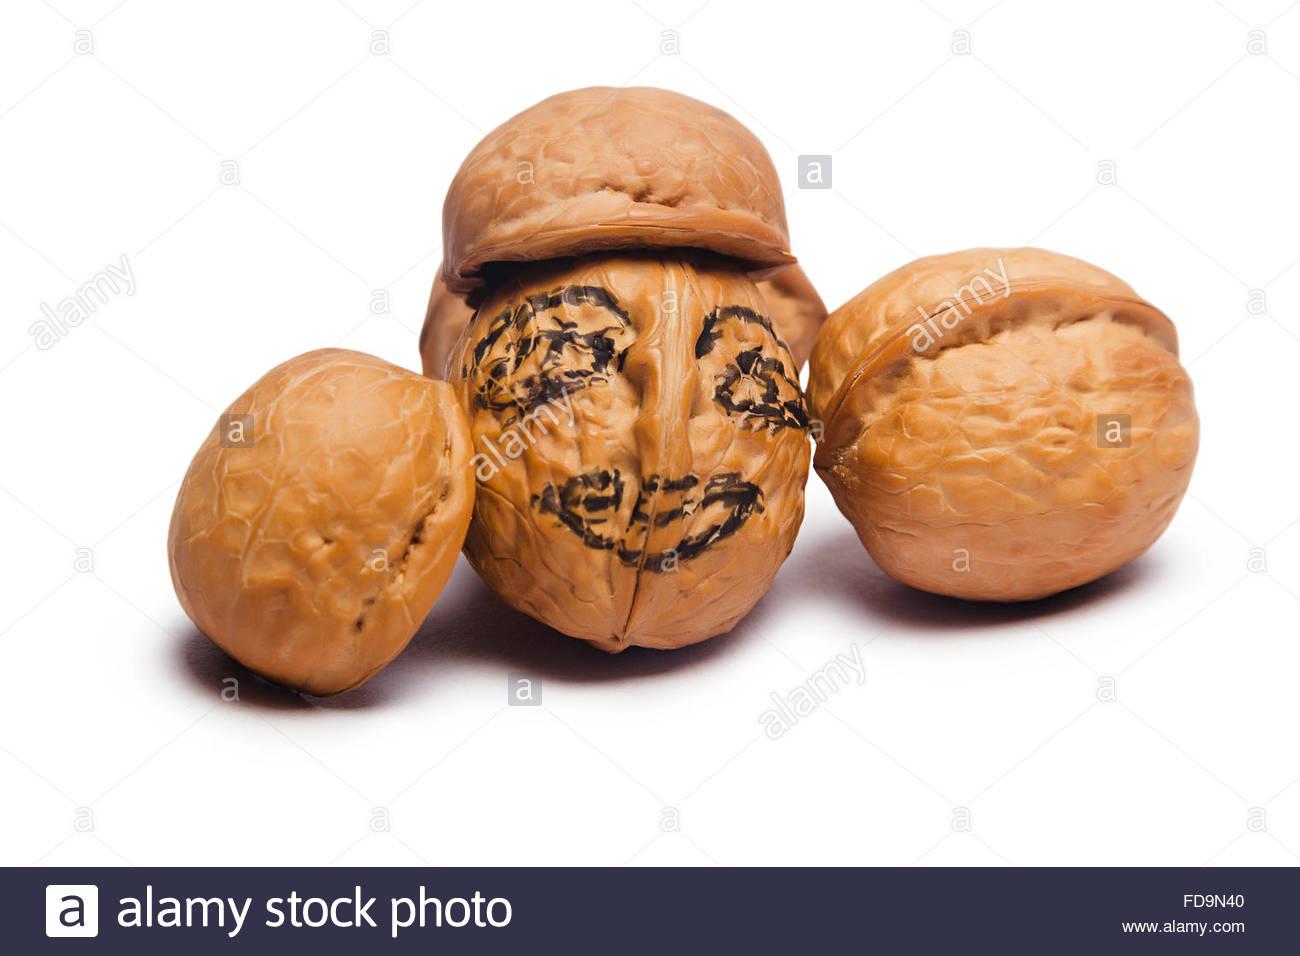 1300x956 Walnut Drawing Face Human Representation Nobody Stock Photo